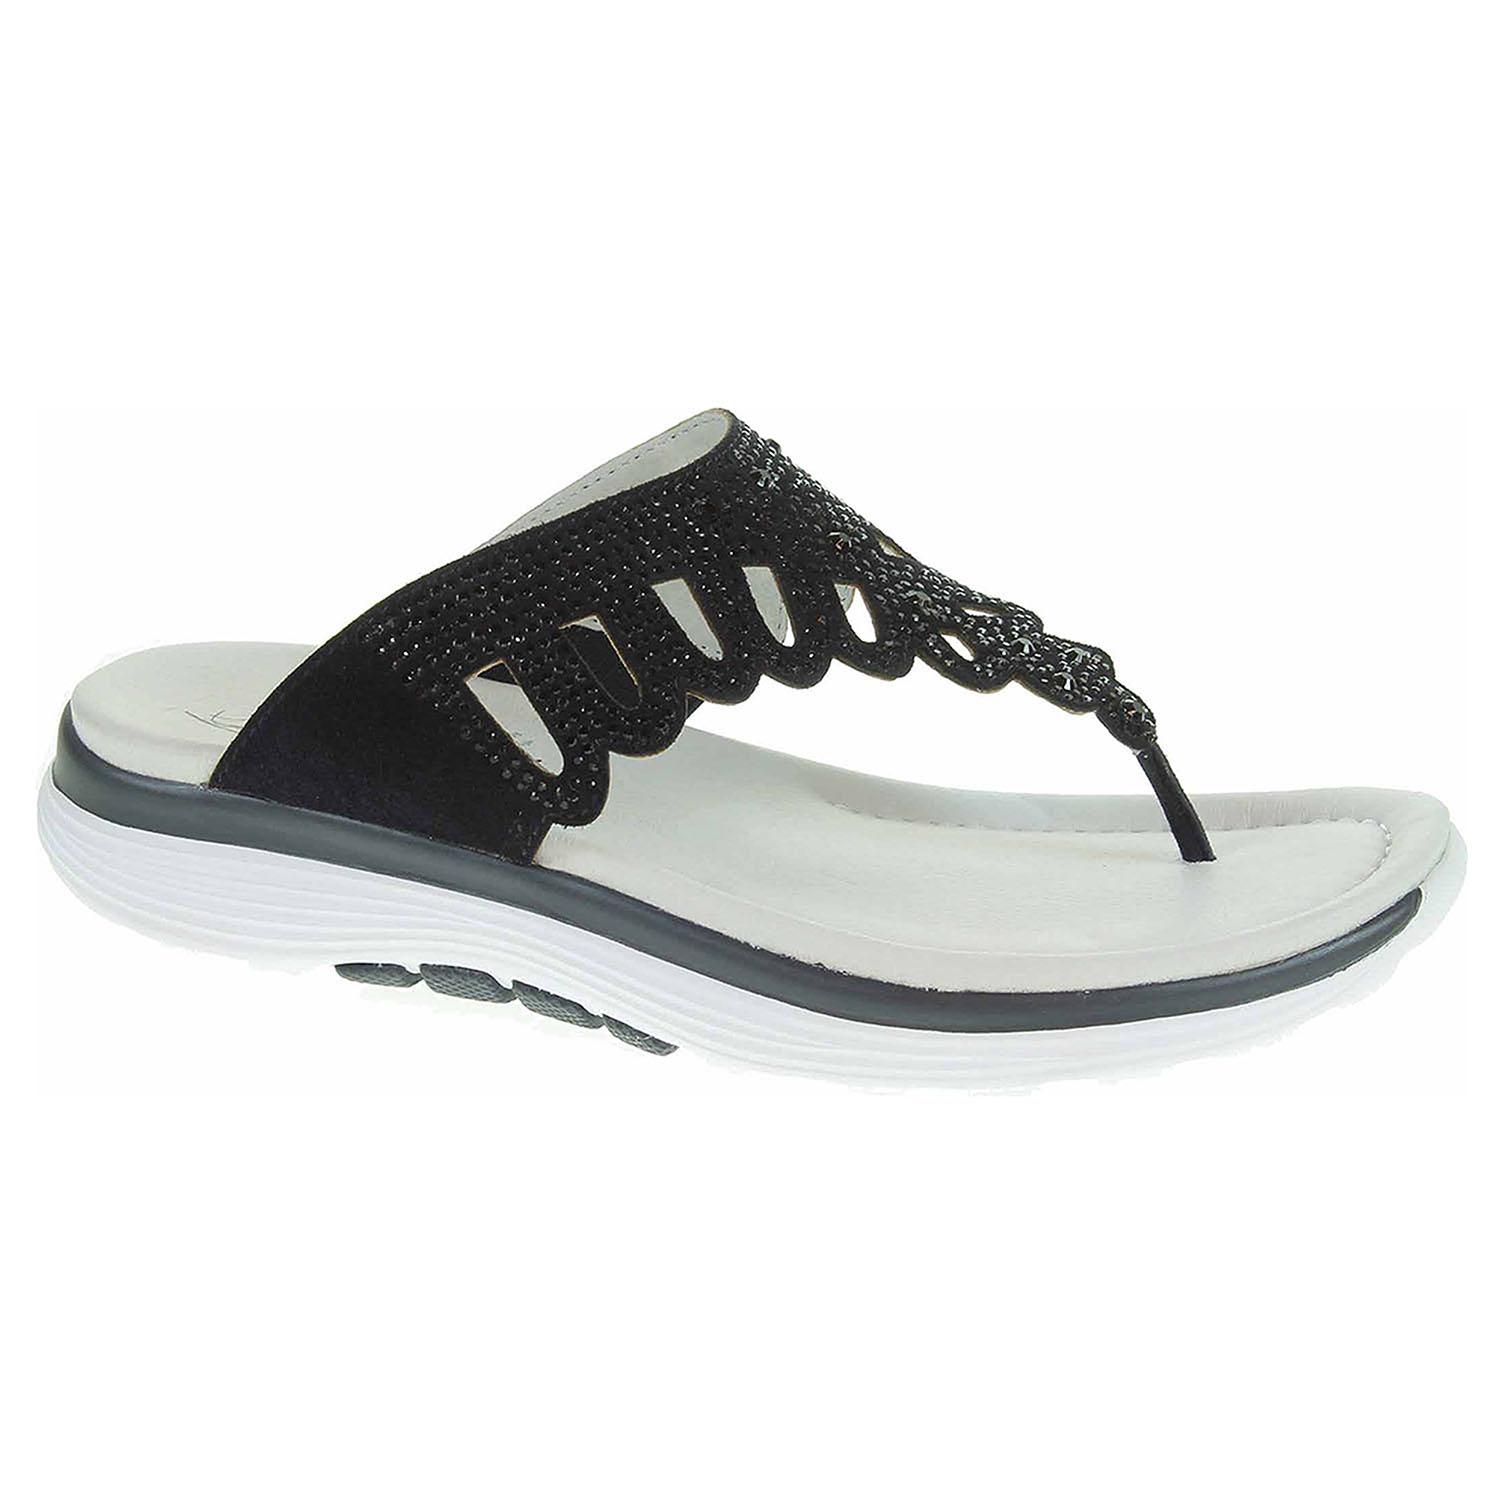 Ecco Dámské pantofle Gabor 86.918.26 pazifik 23600863